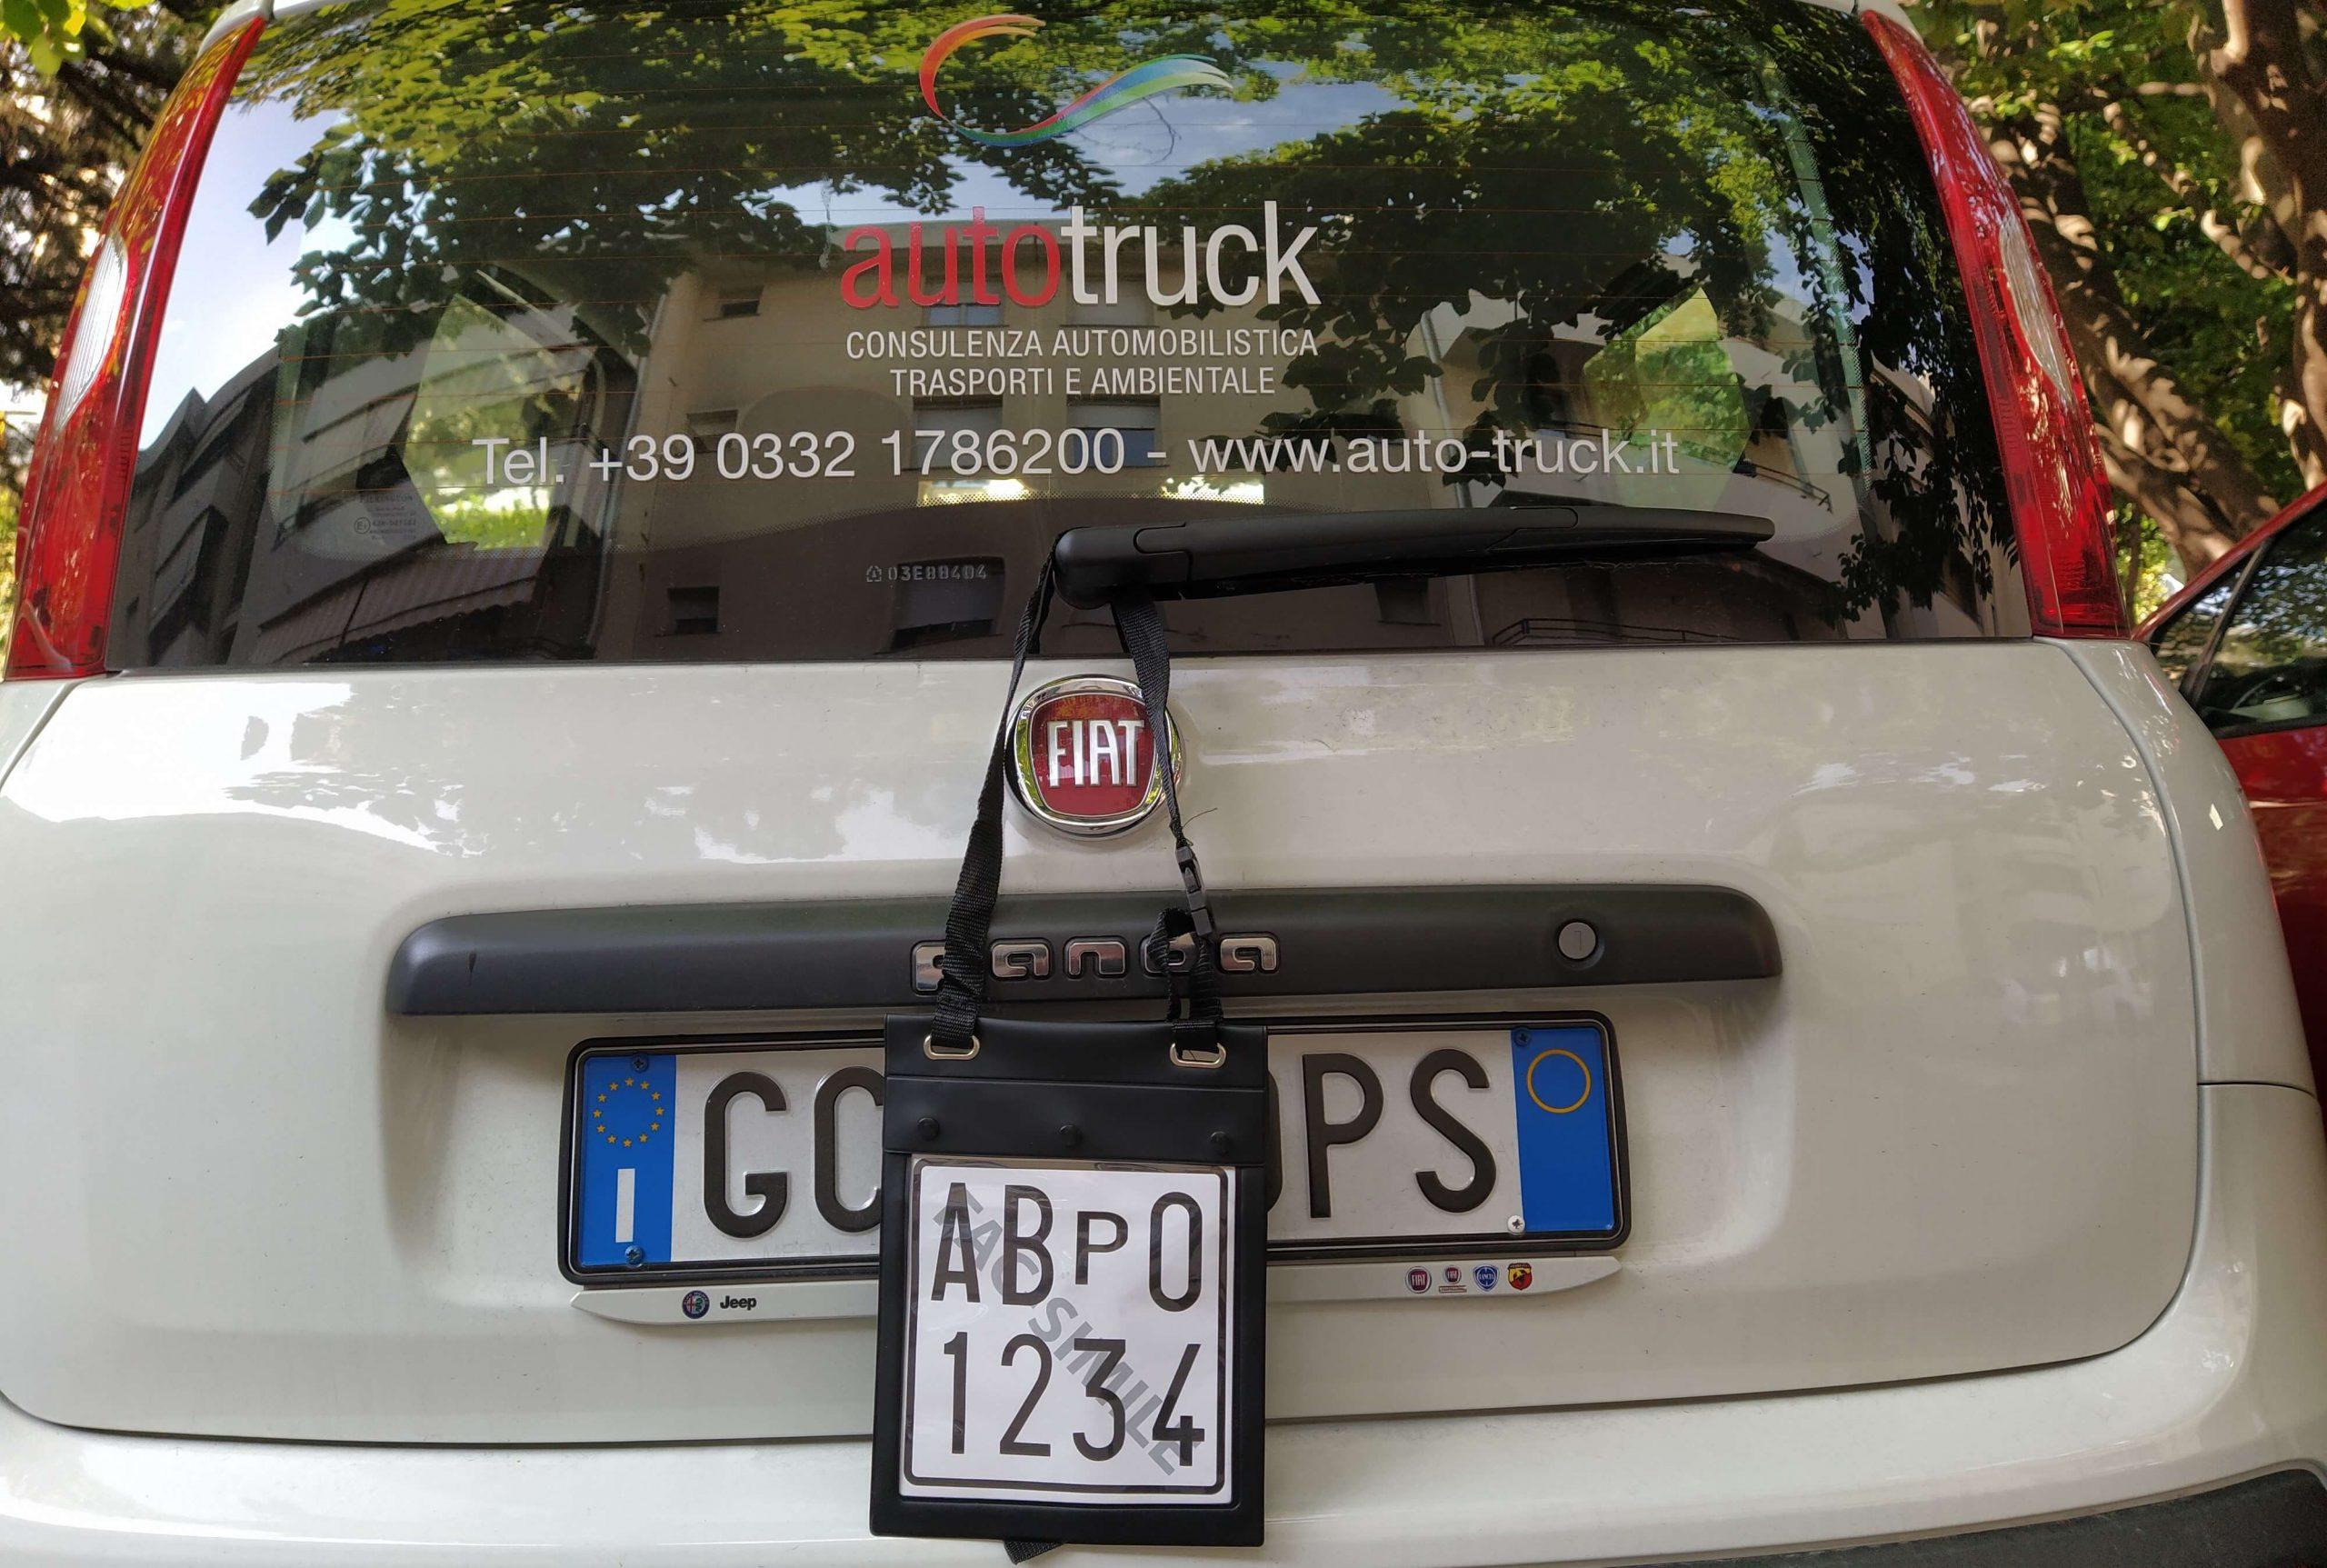 Auto-truck-pratiche-auto-targa-prova